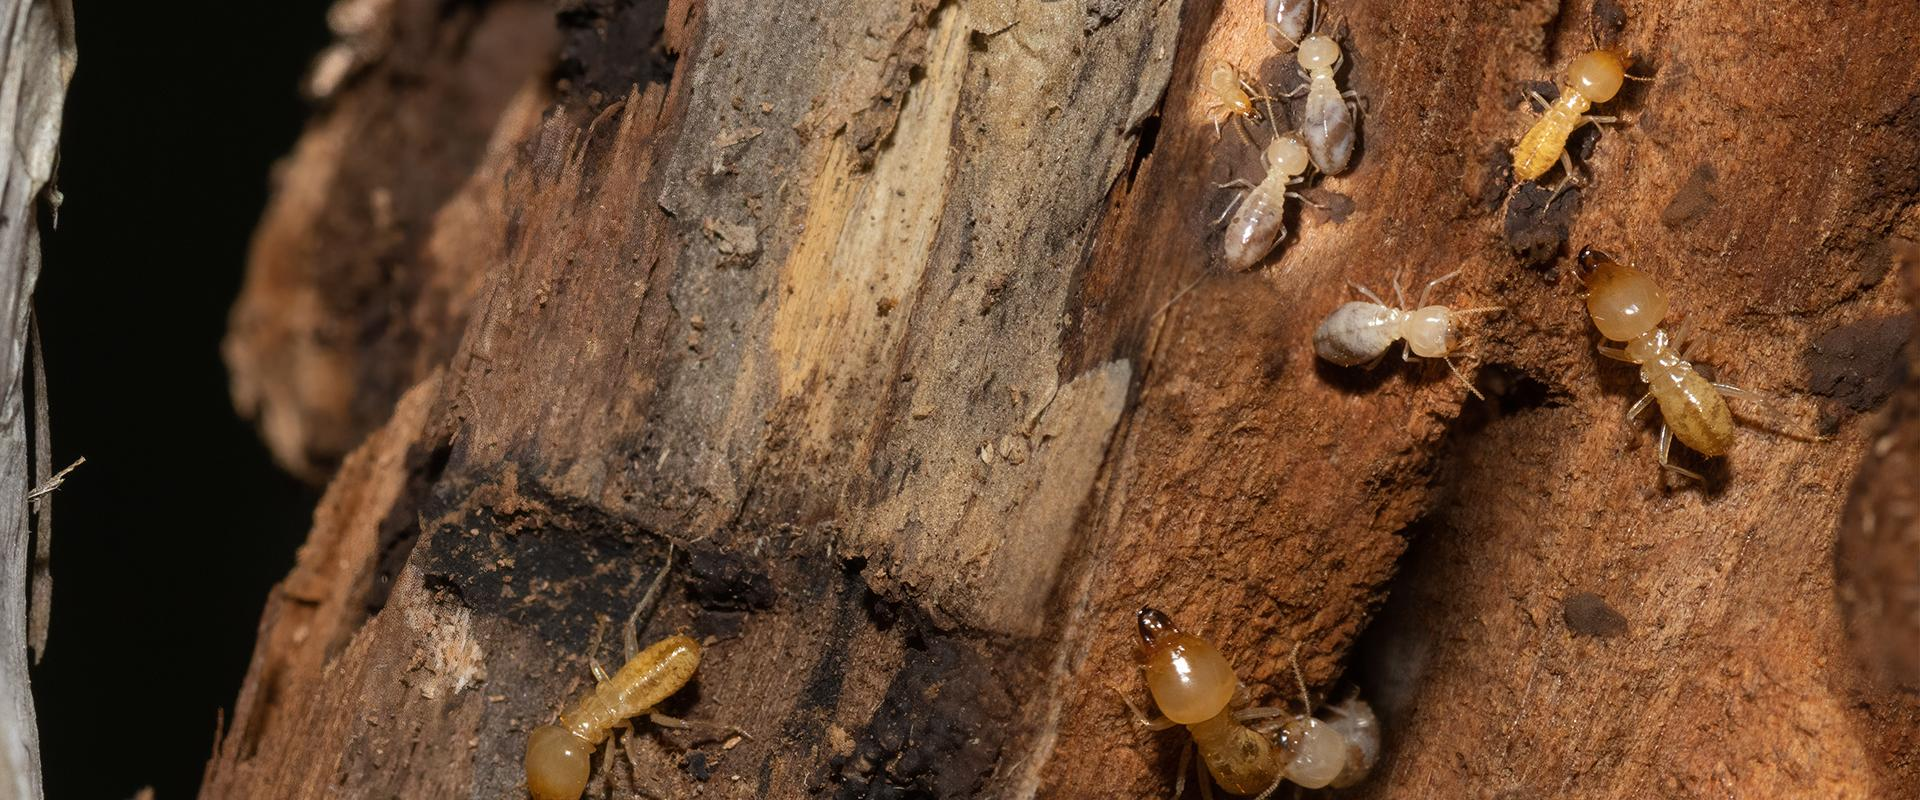 termites on wood in mesa arizona